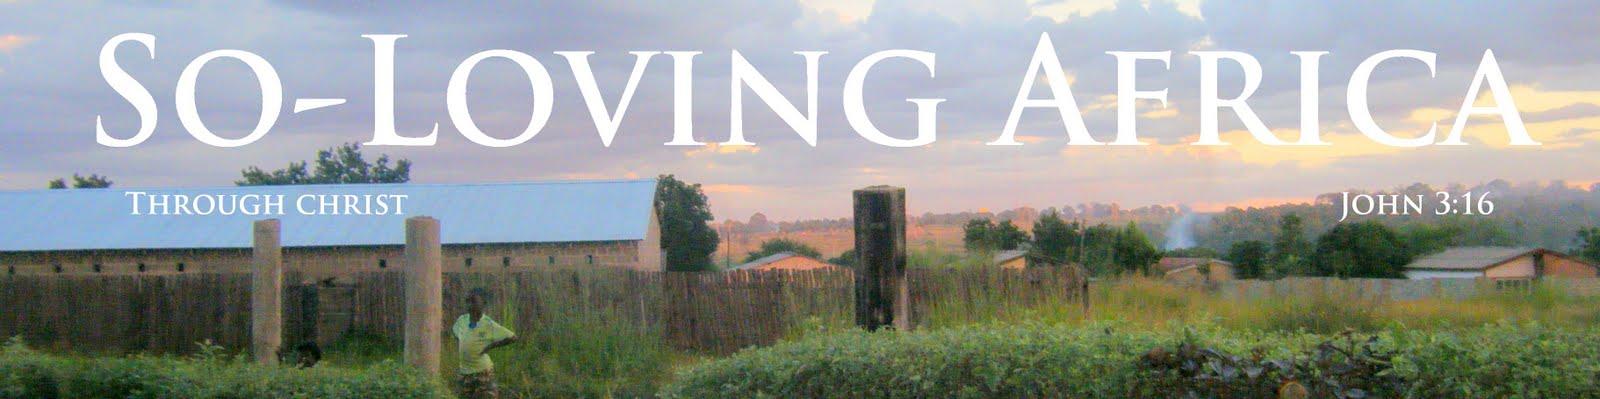 solovingafrica